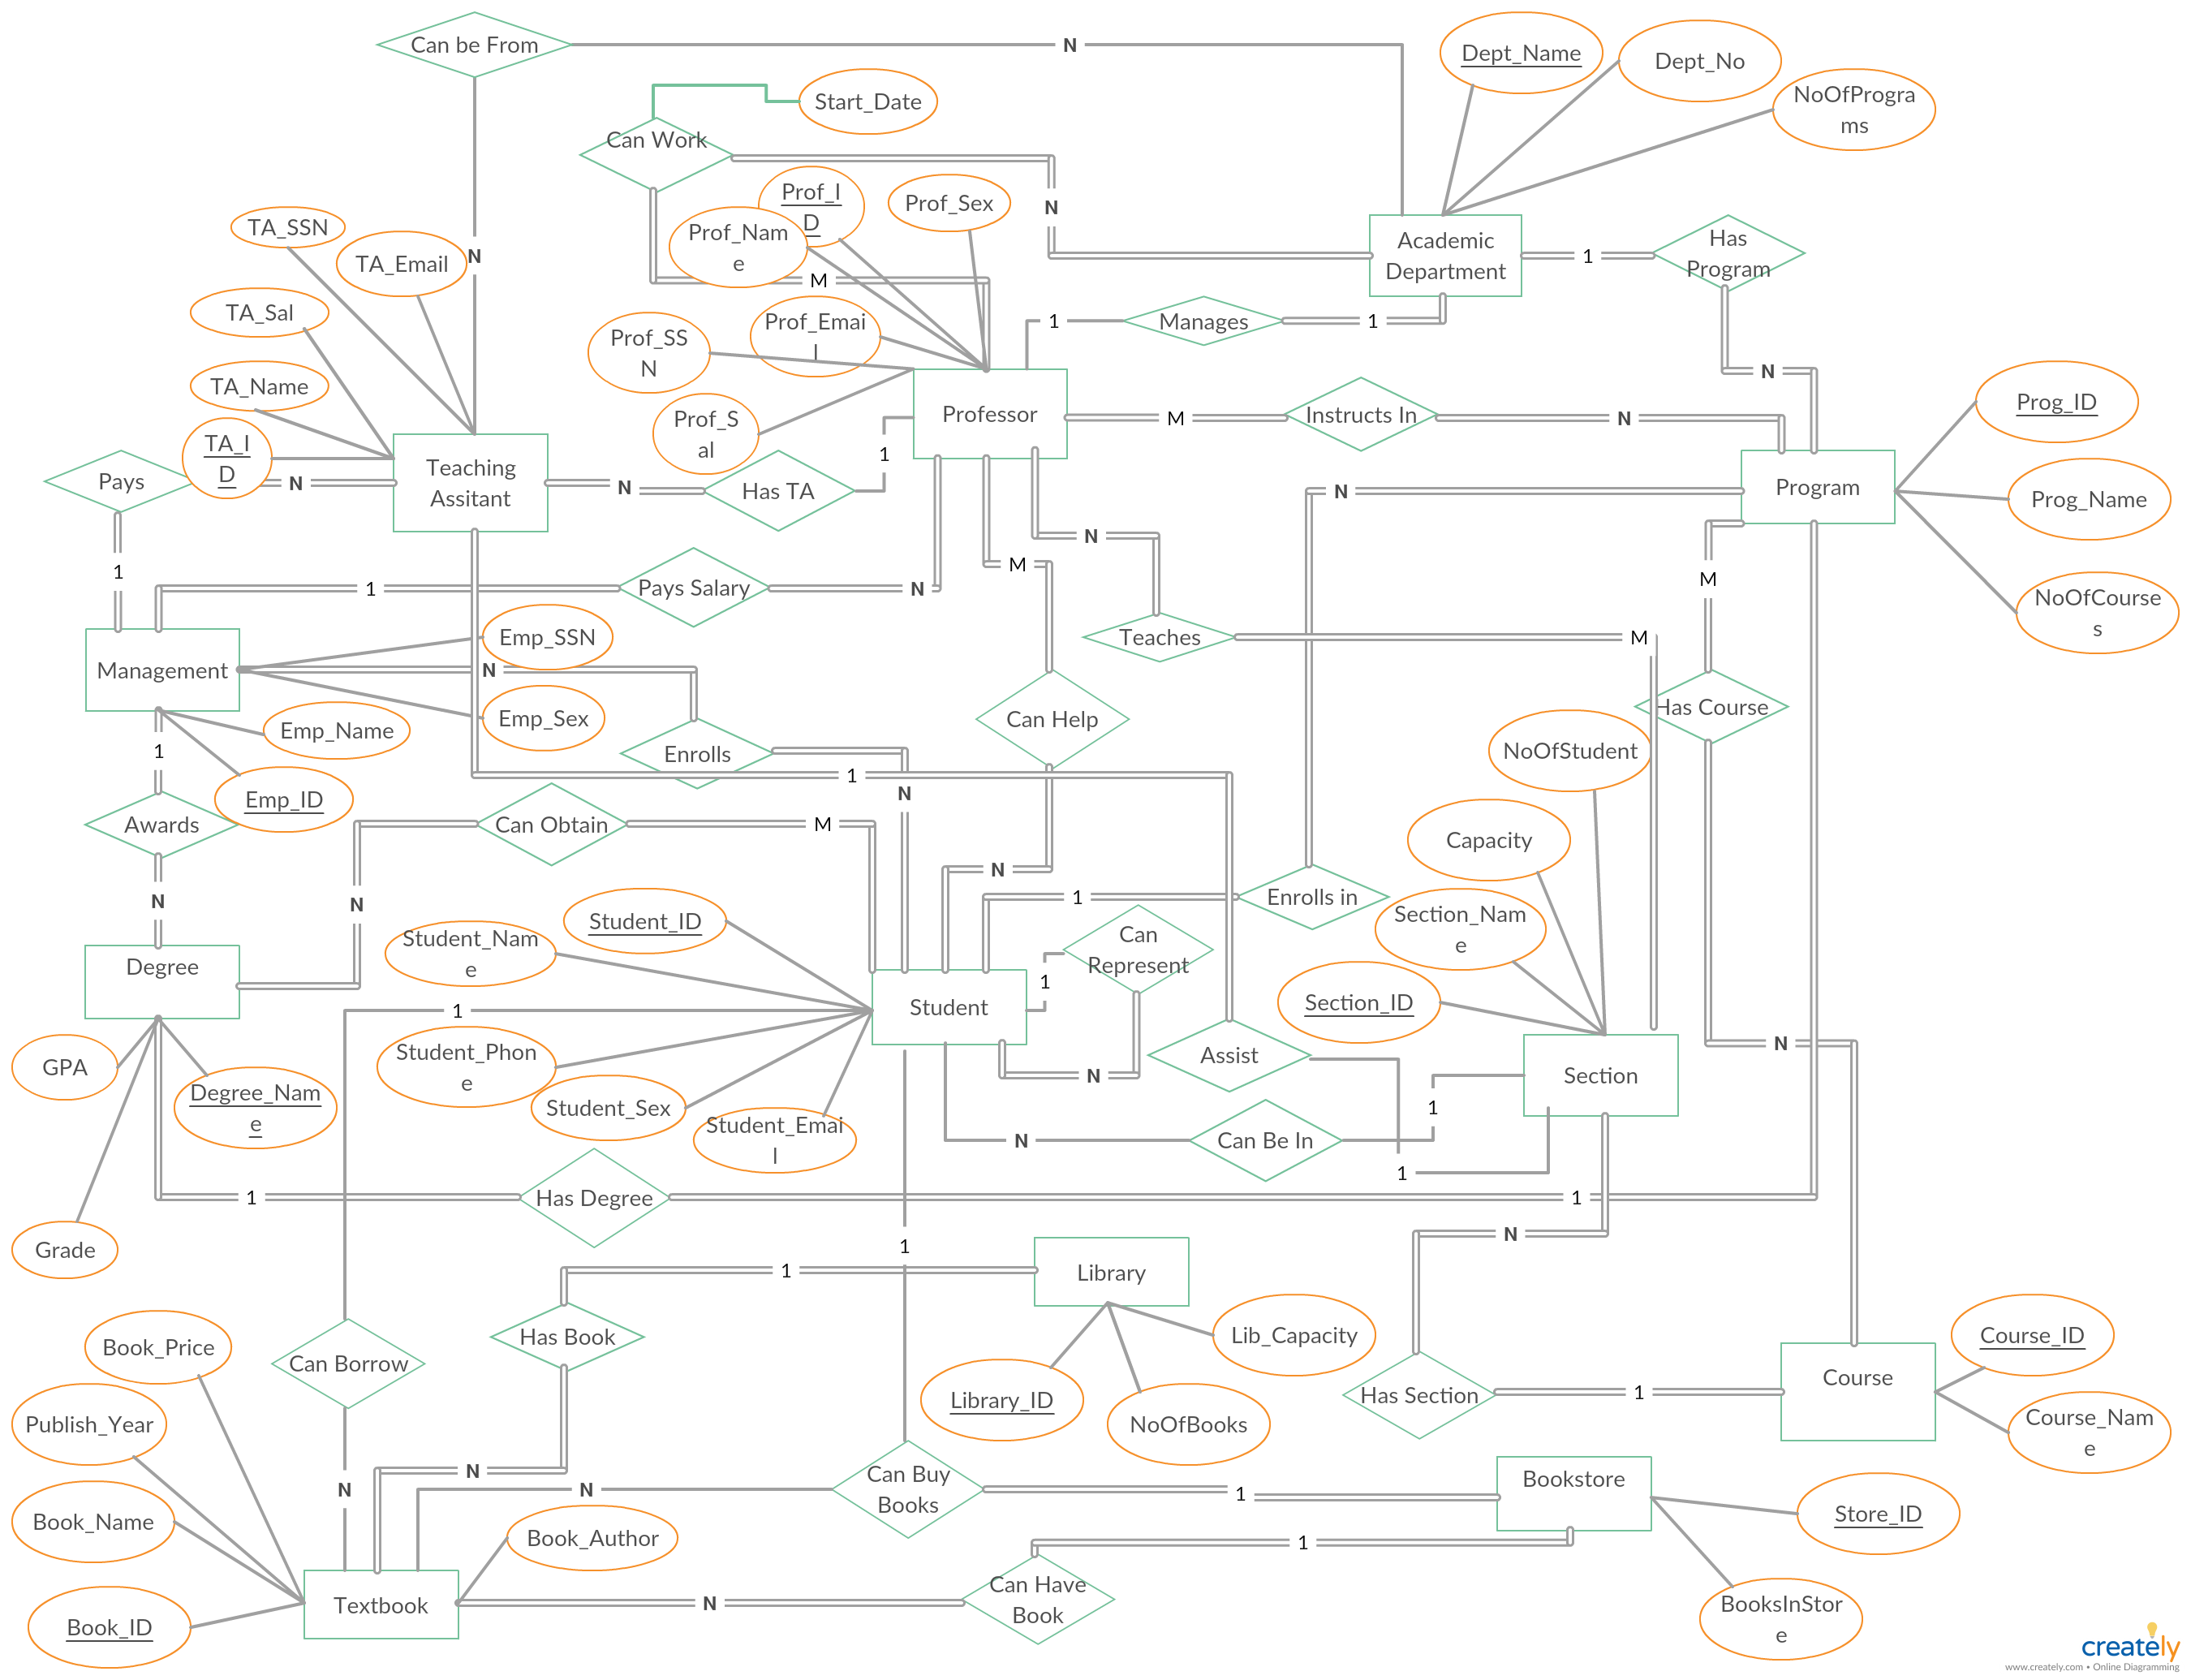 Diagram] Entity Relationship Diagram For Faculty Management